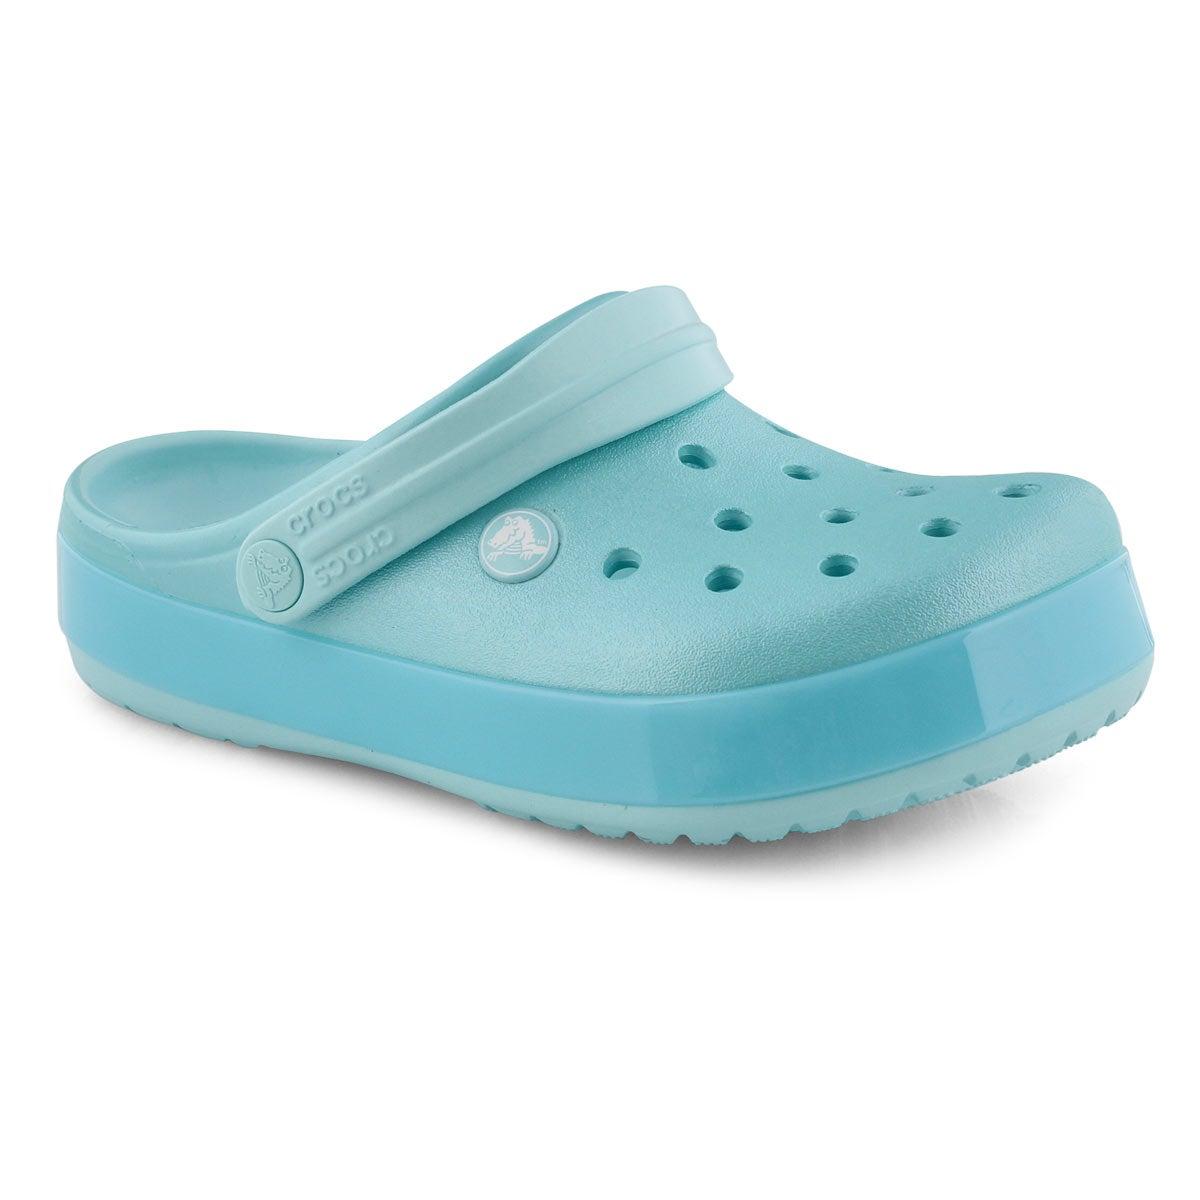 Grls Crocband Ice Pop ice blue EVA clog